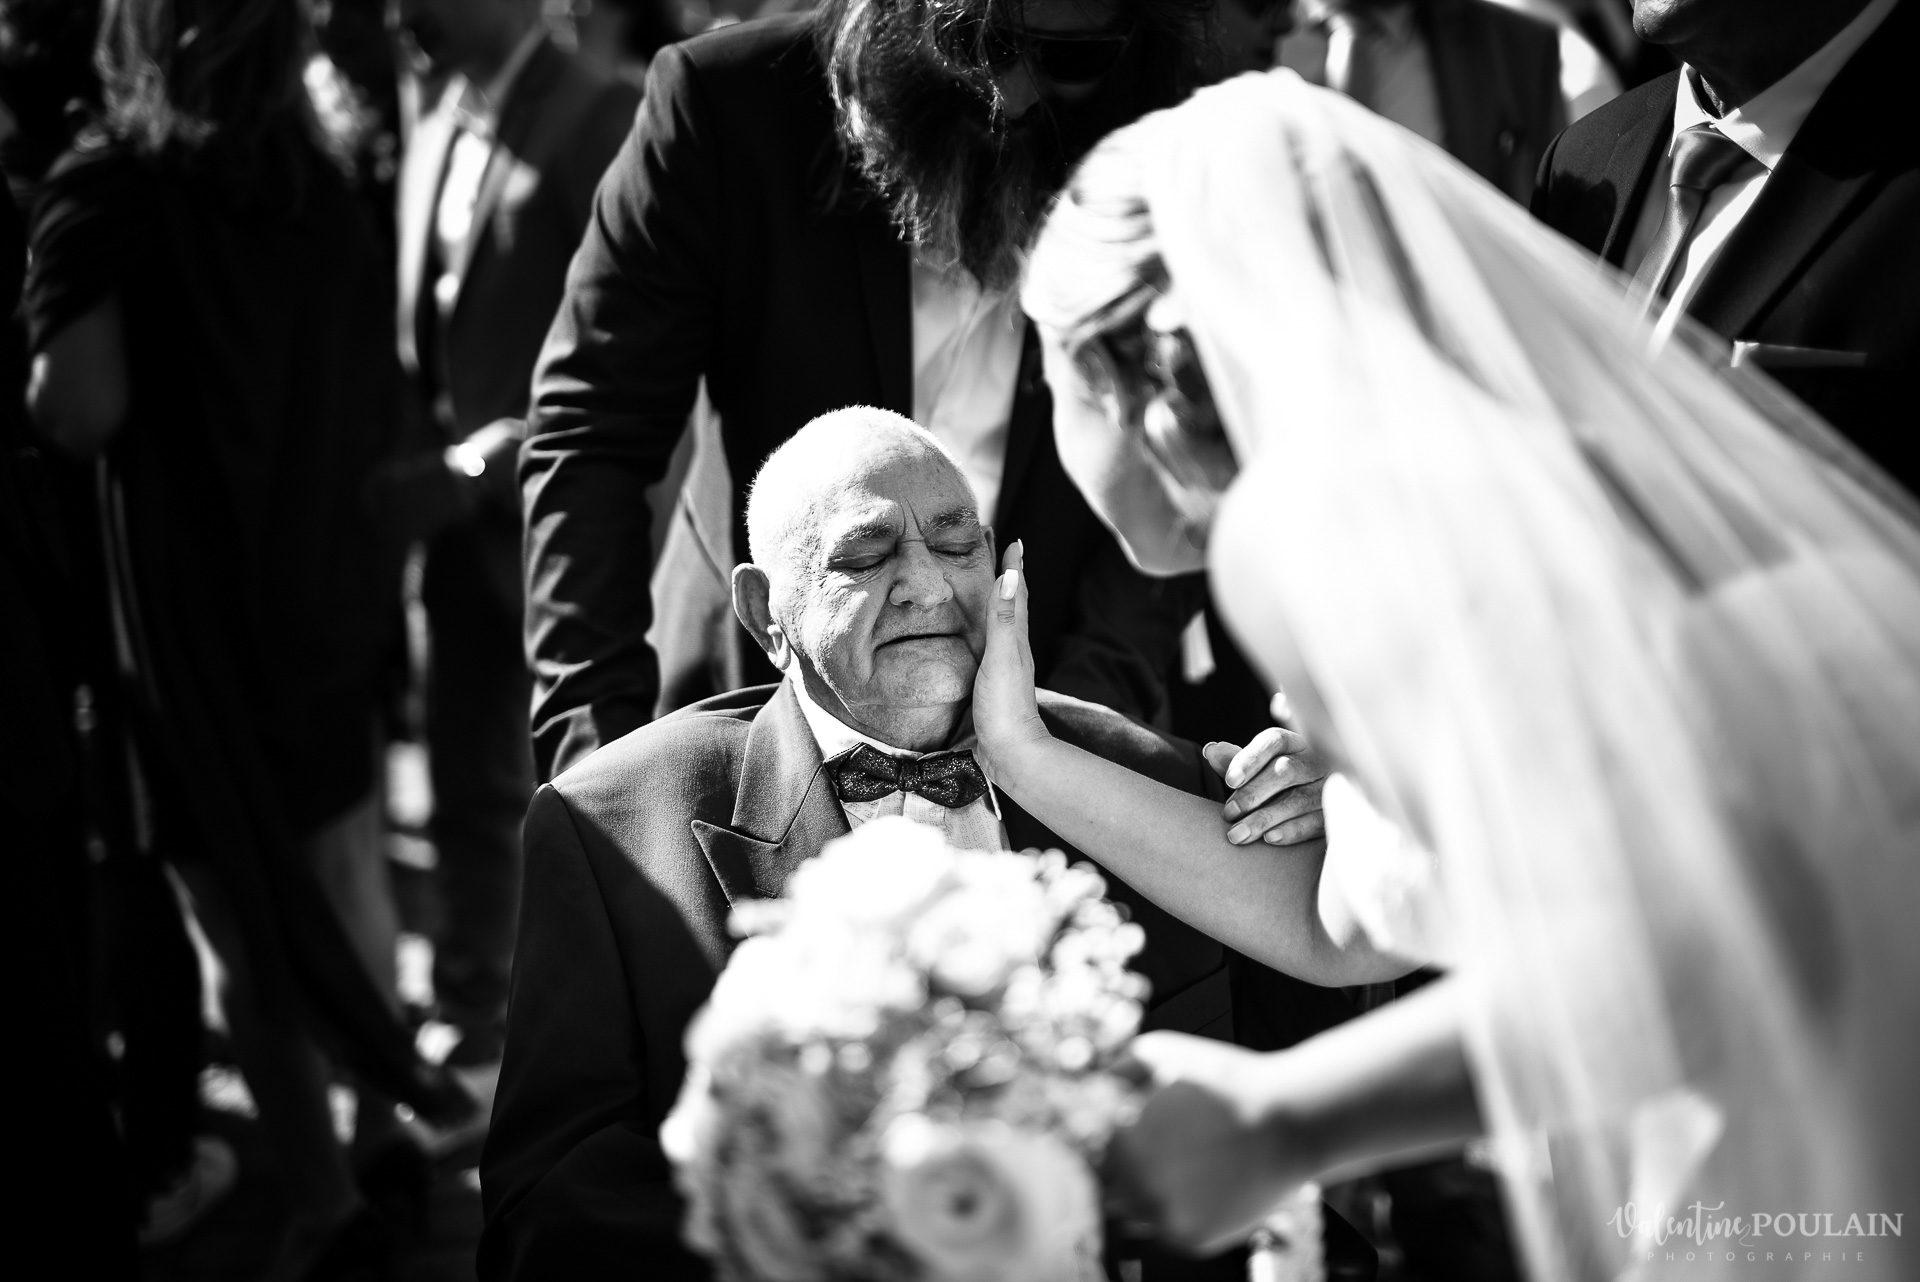 Mariage fun Petit Wettolsheim - Valentine Poulain papy